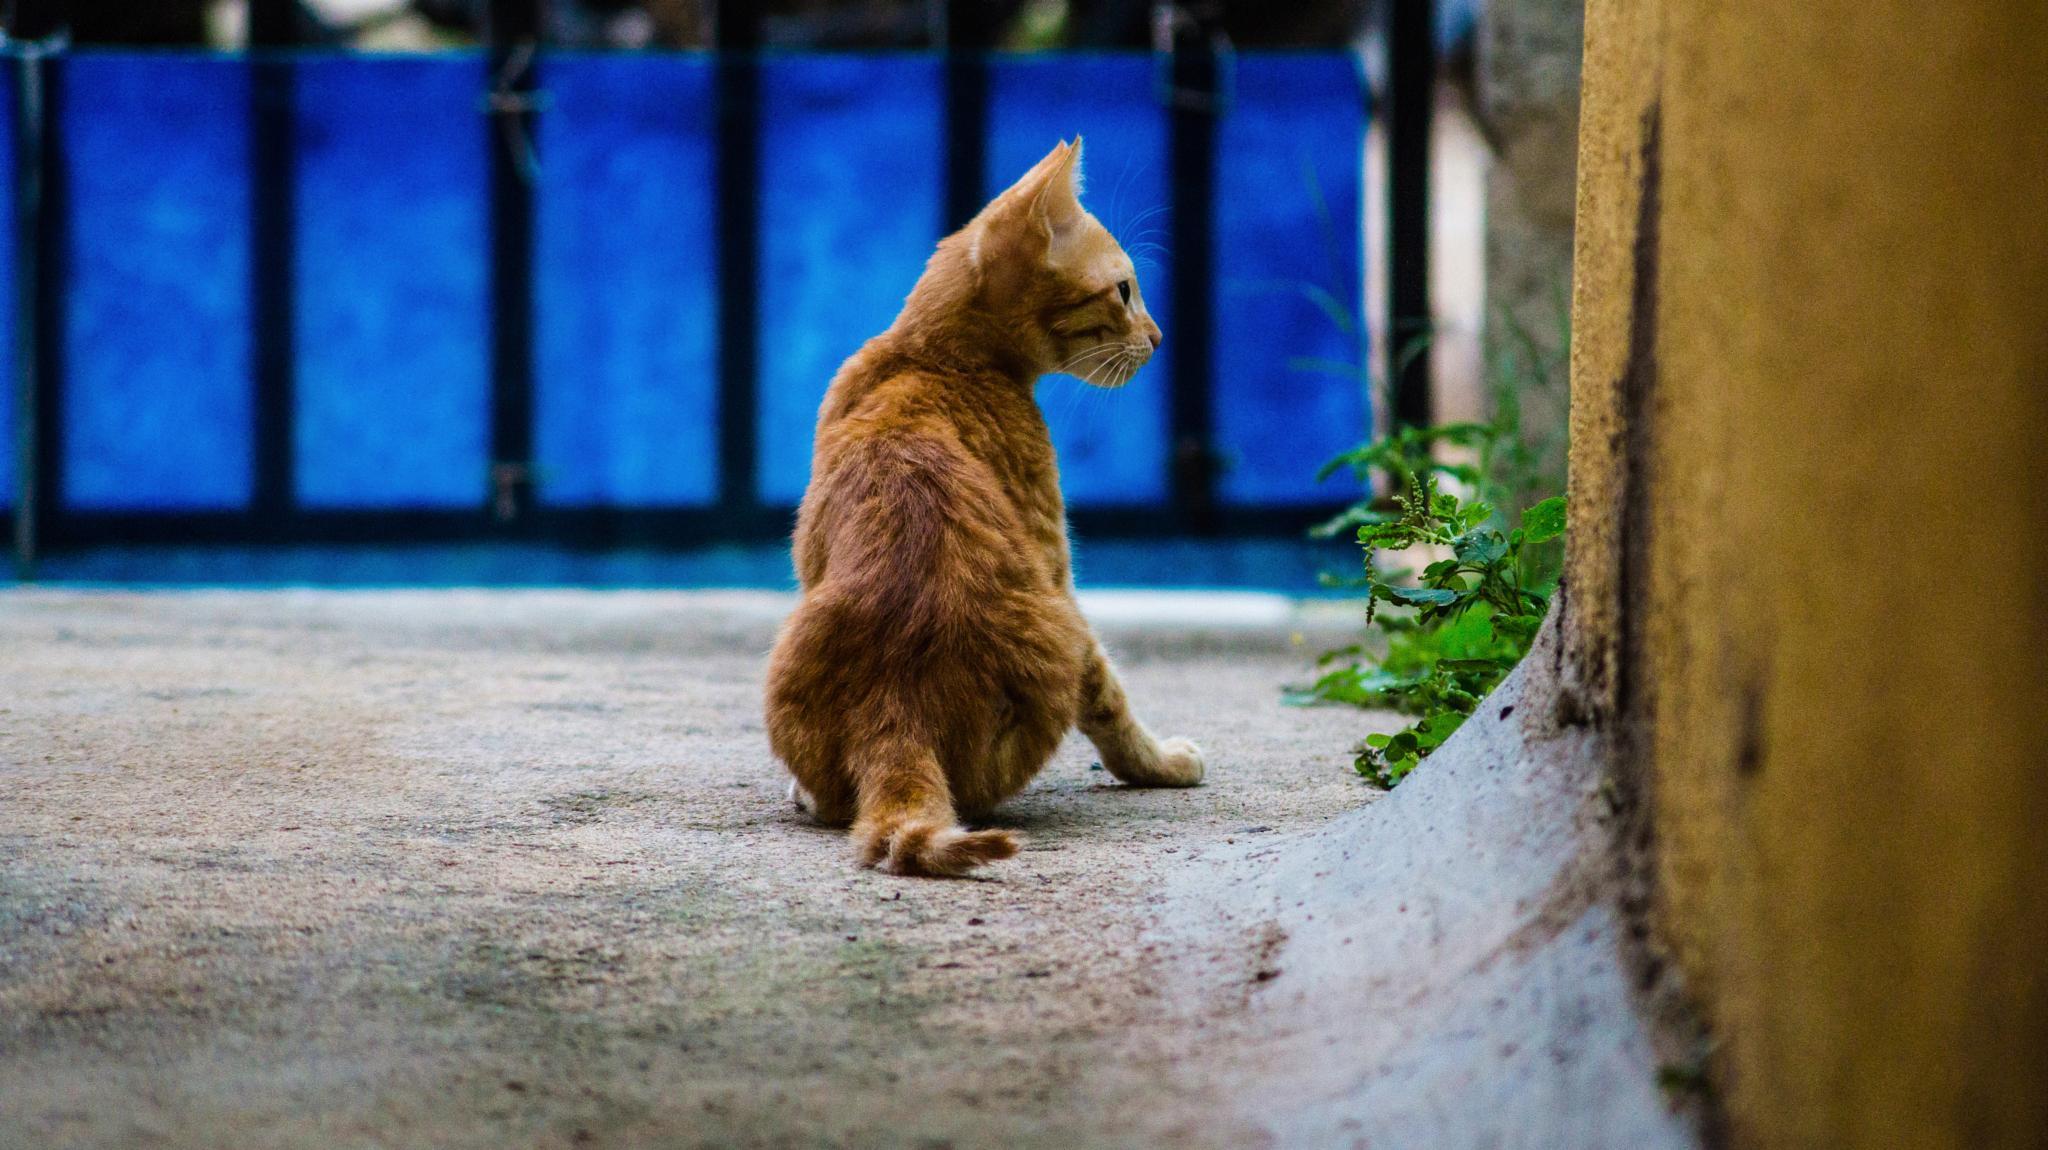 searching for prey  by rkramtej